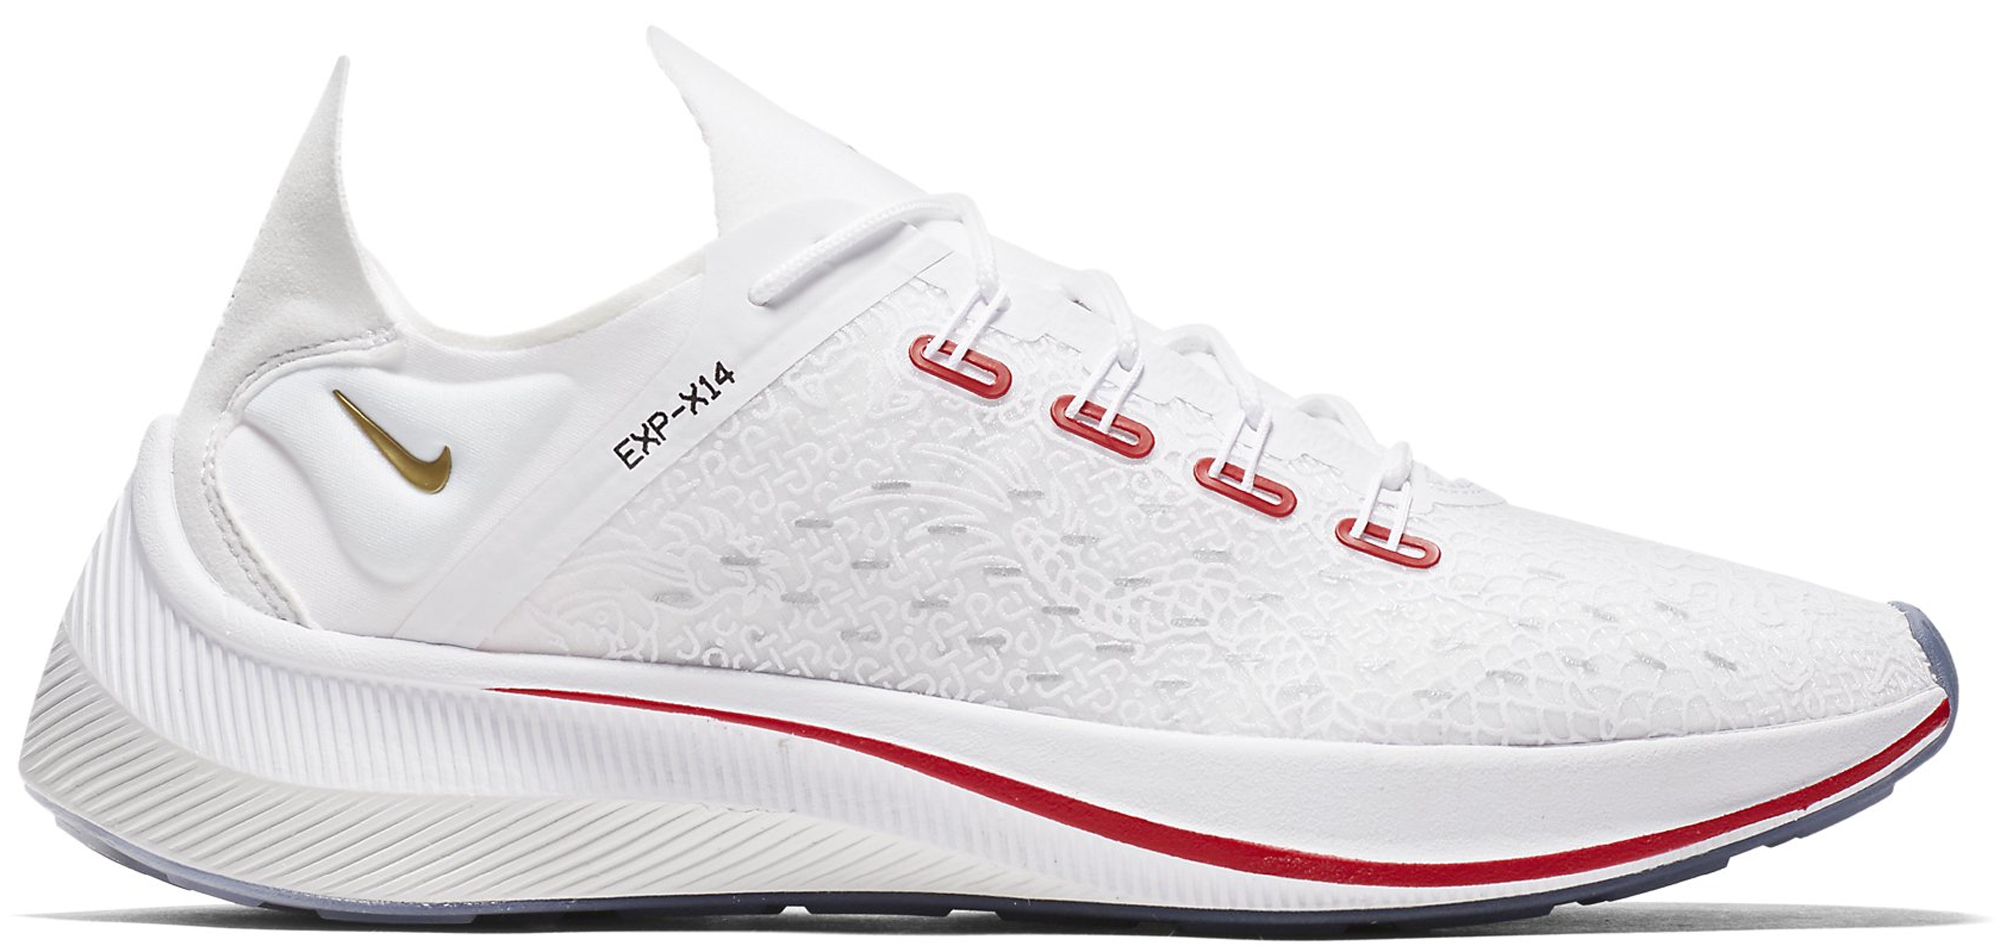 Nike EXP-X14 CR7 Cristiano Ronaldo